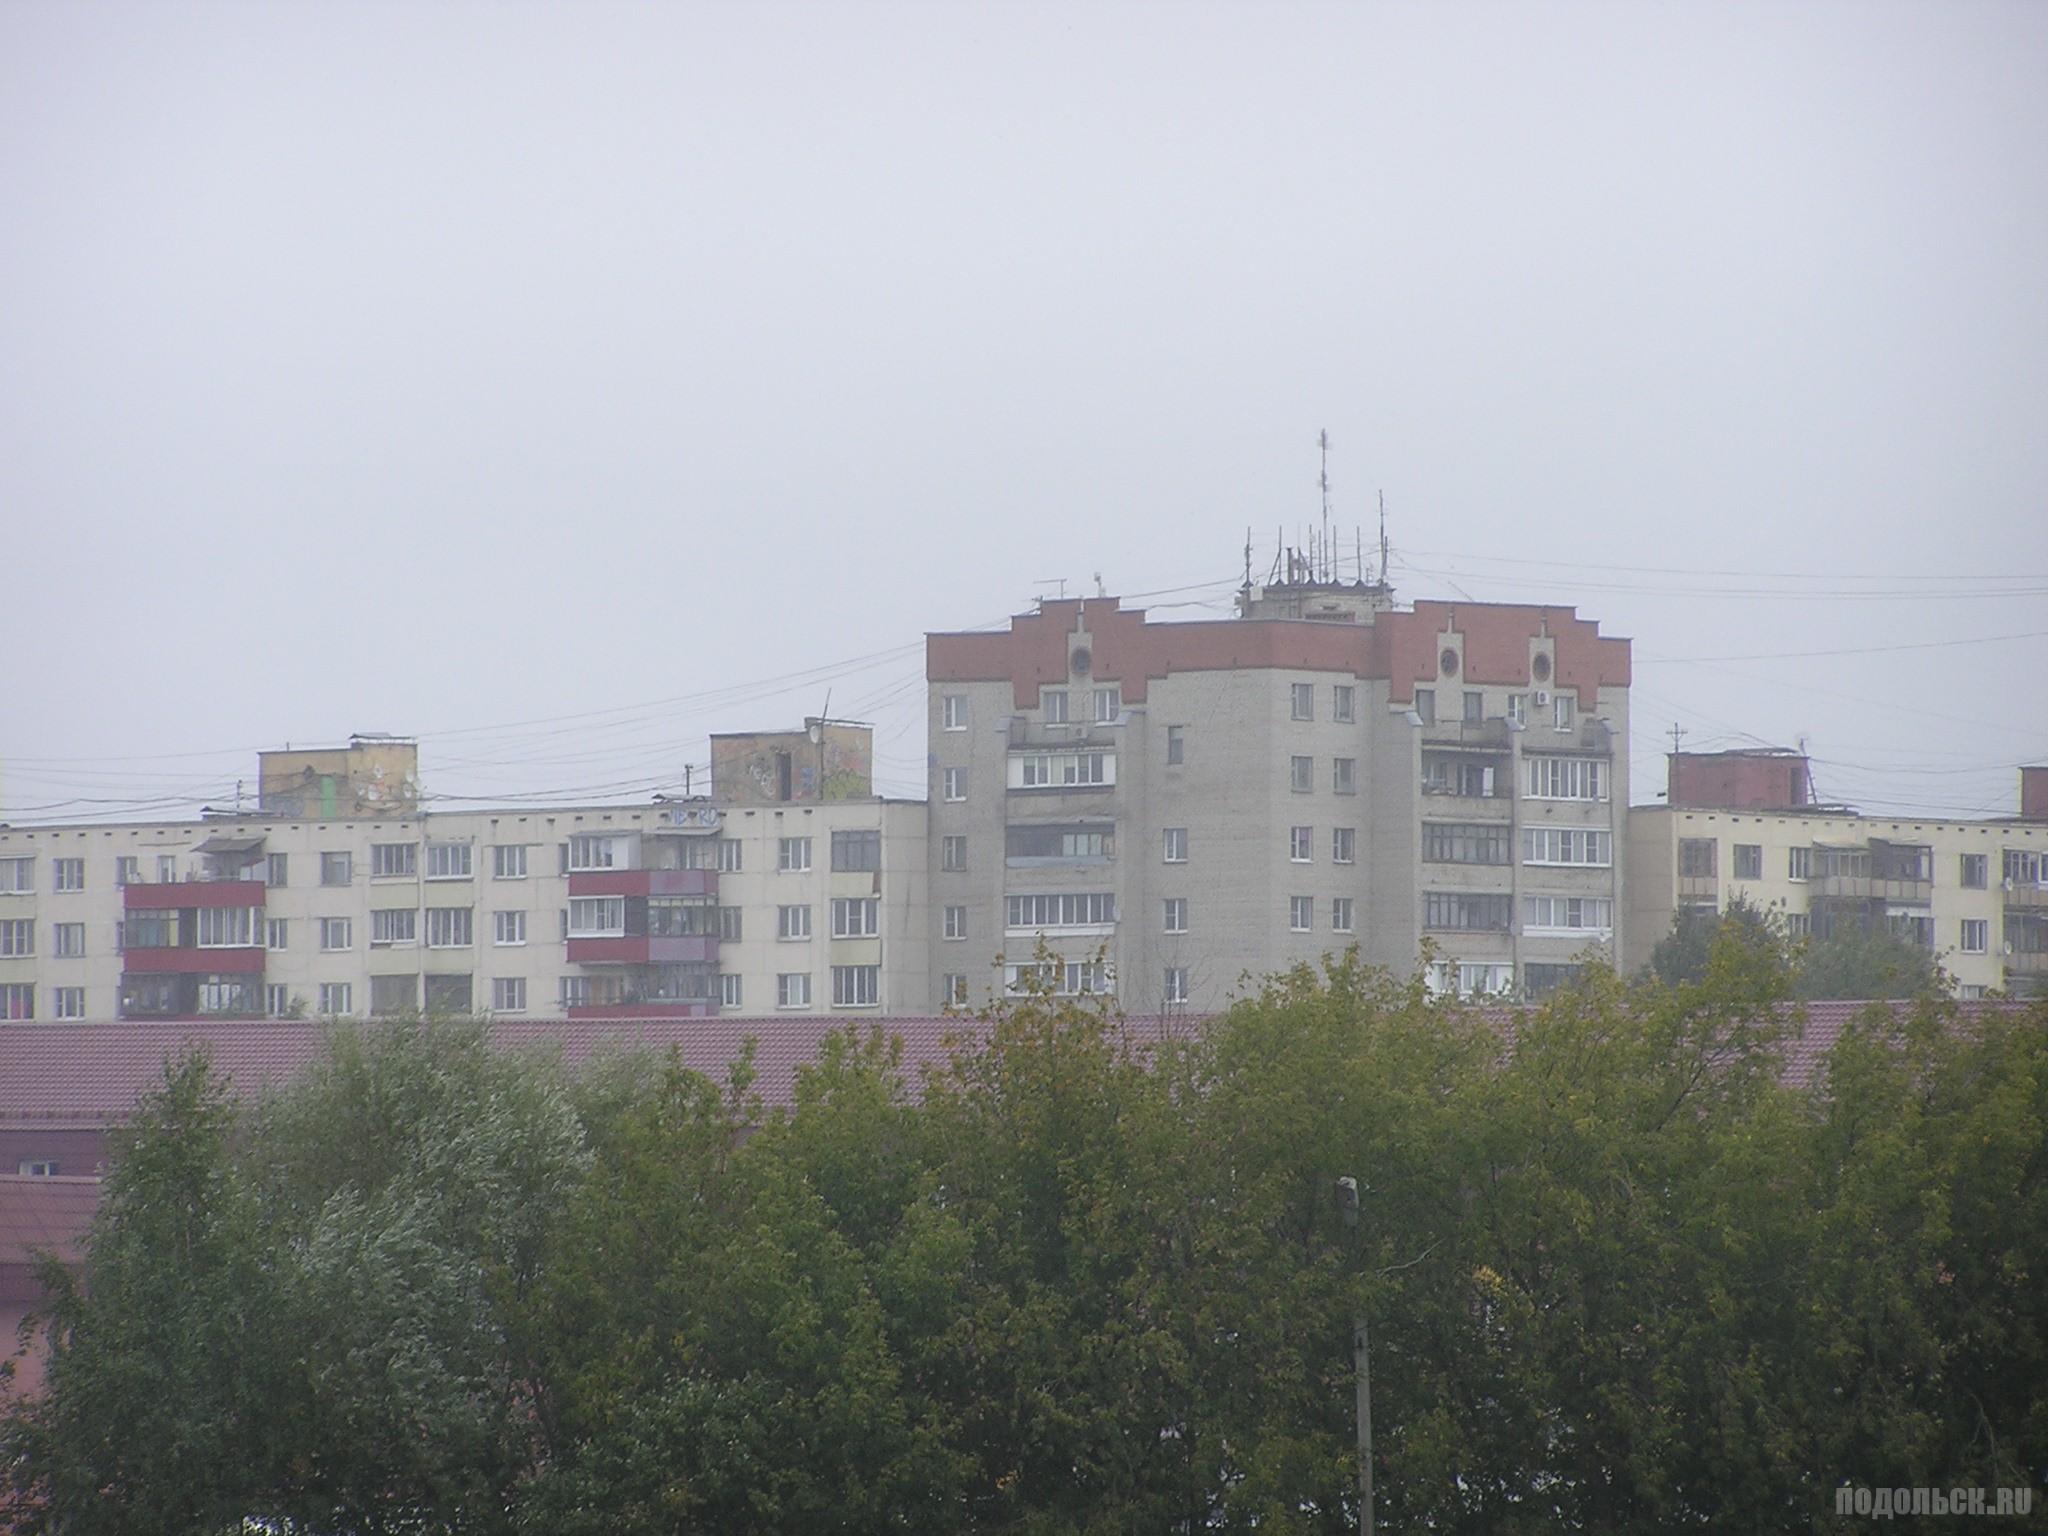 Быковская улица. 18.09.16.